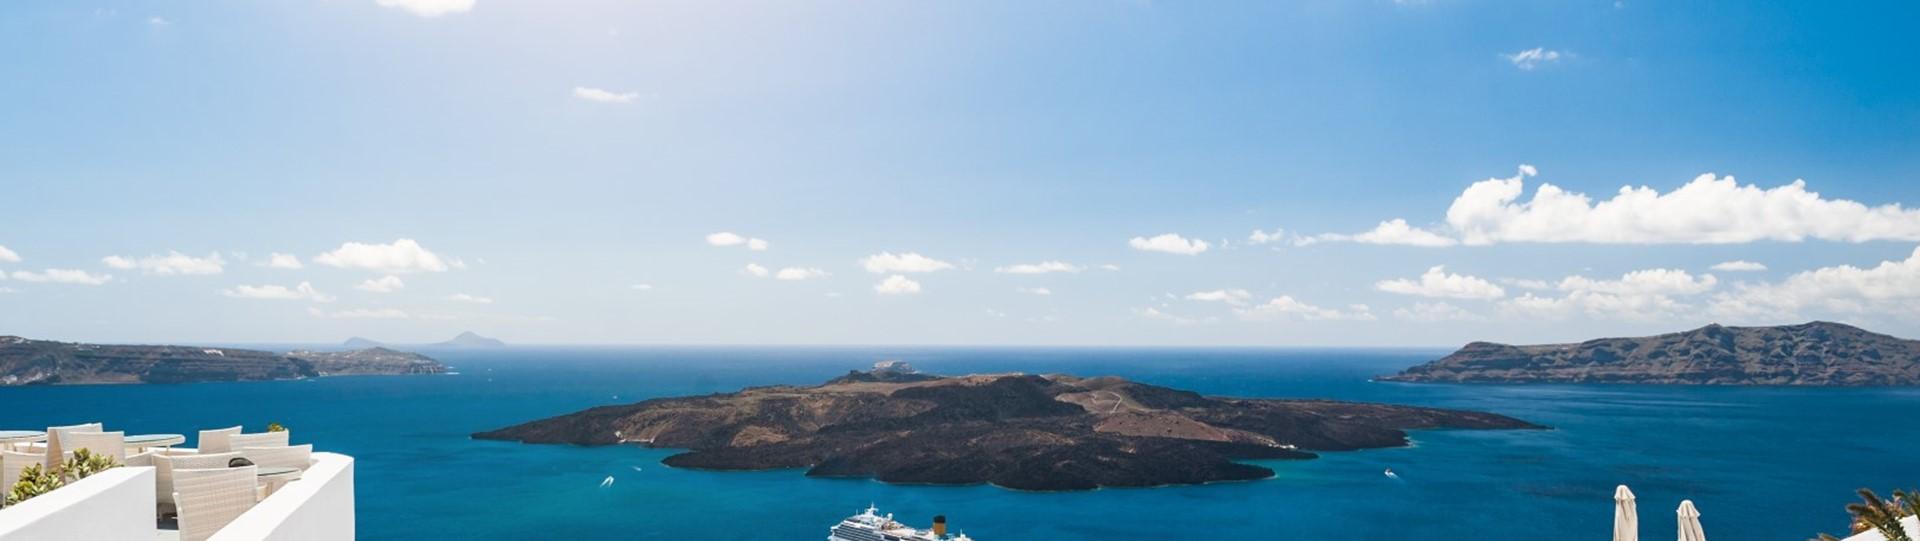 Reisvoorstelling begeleide cruises